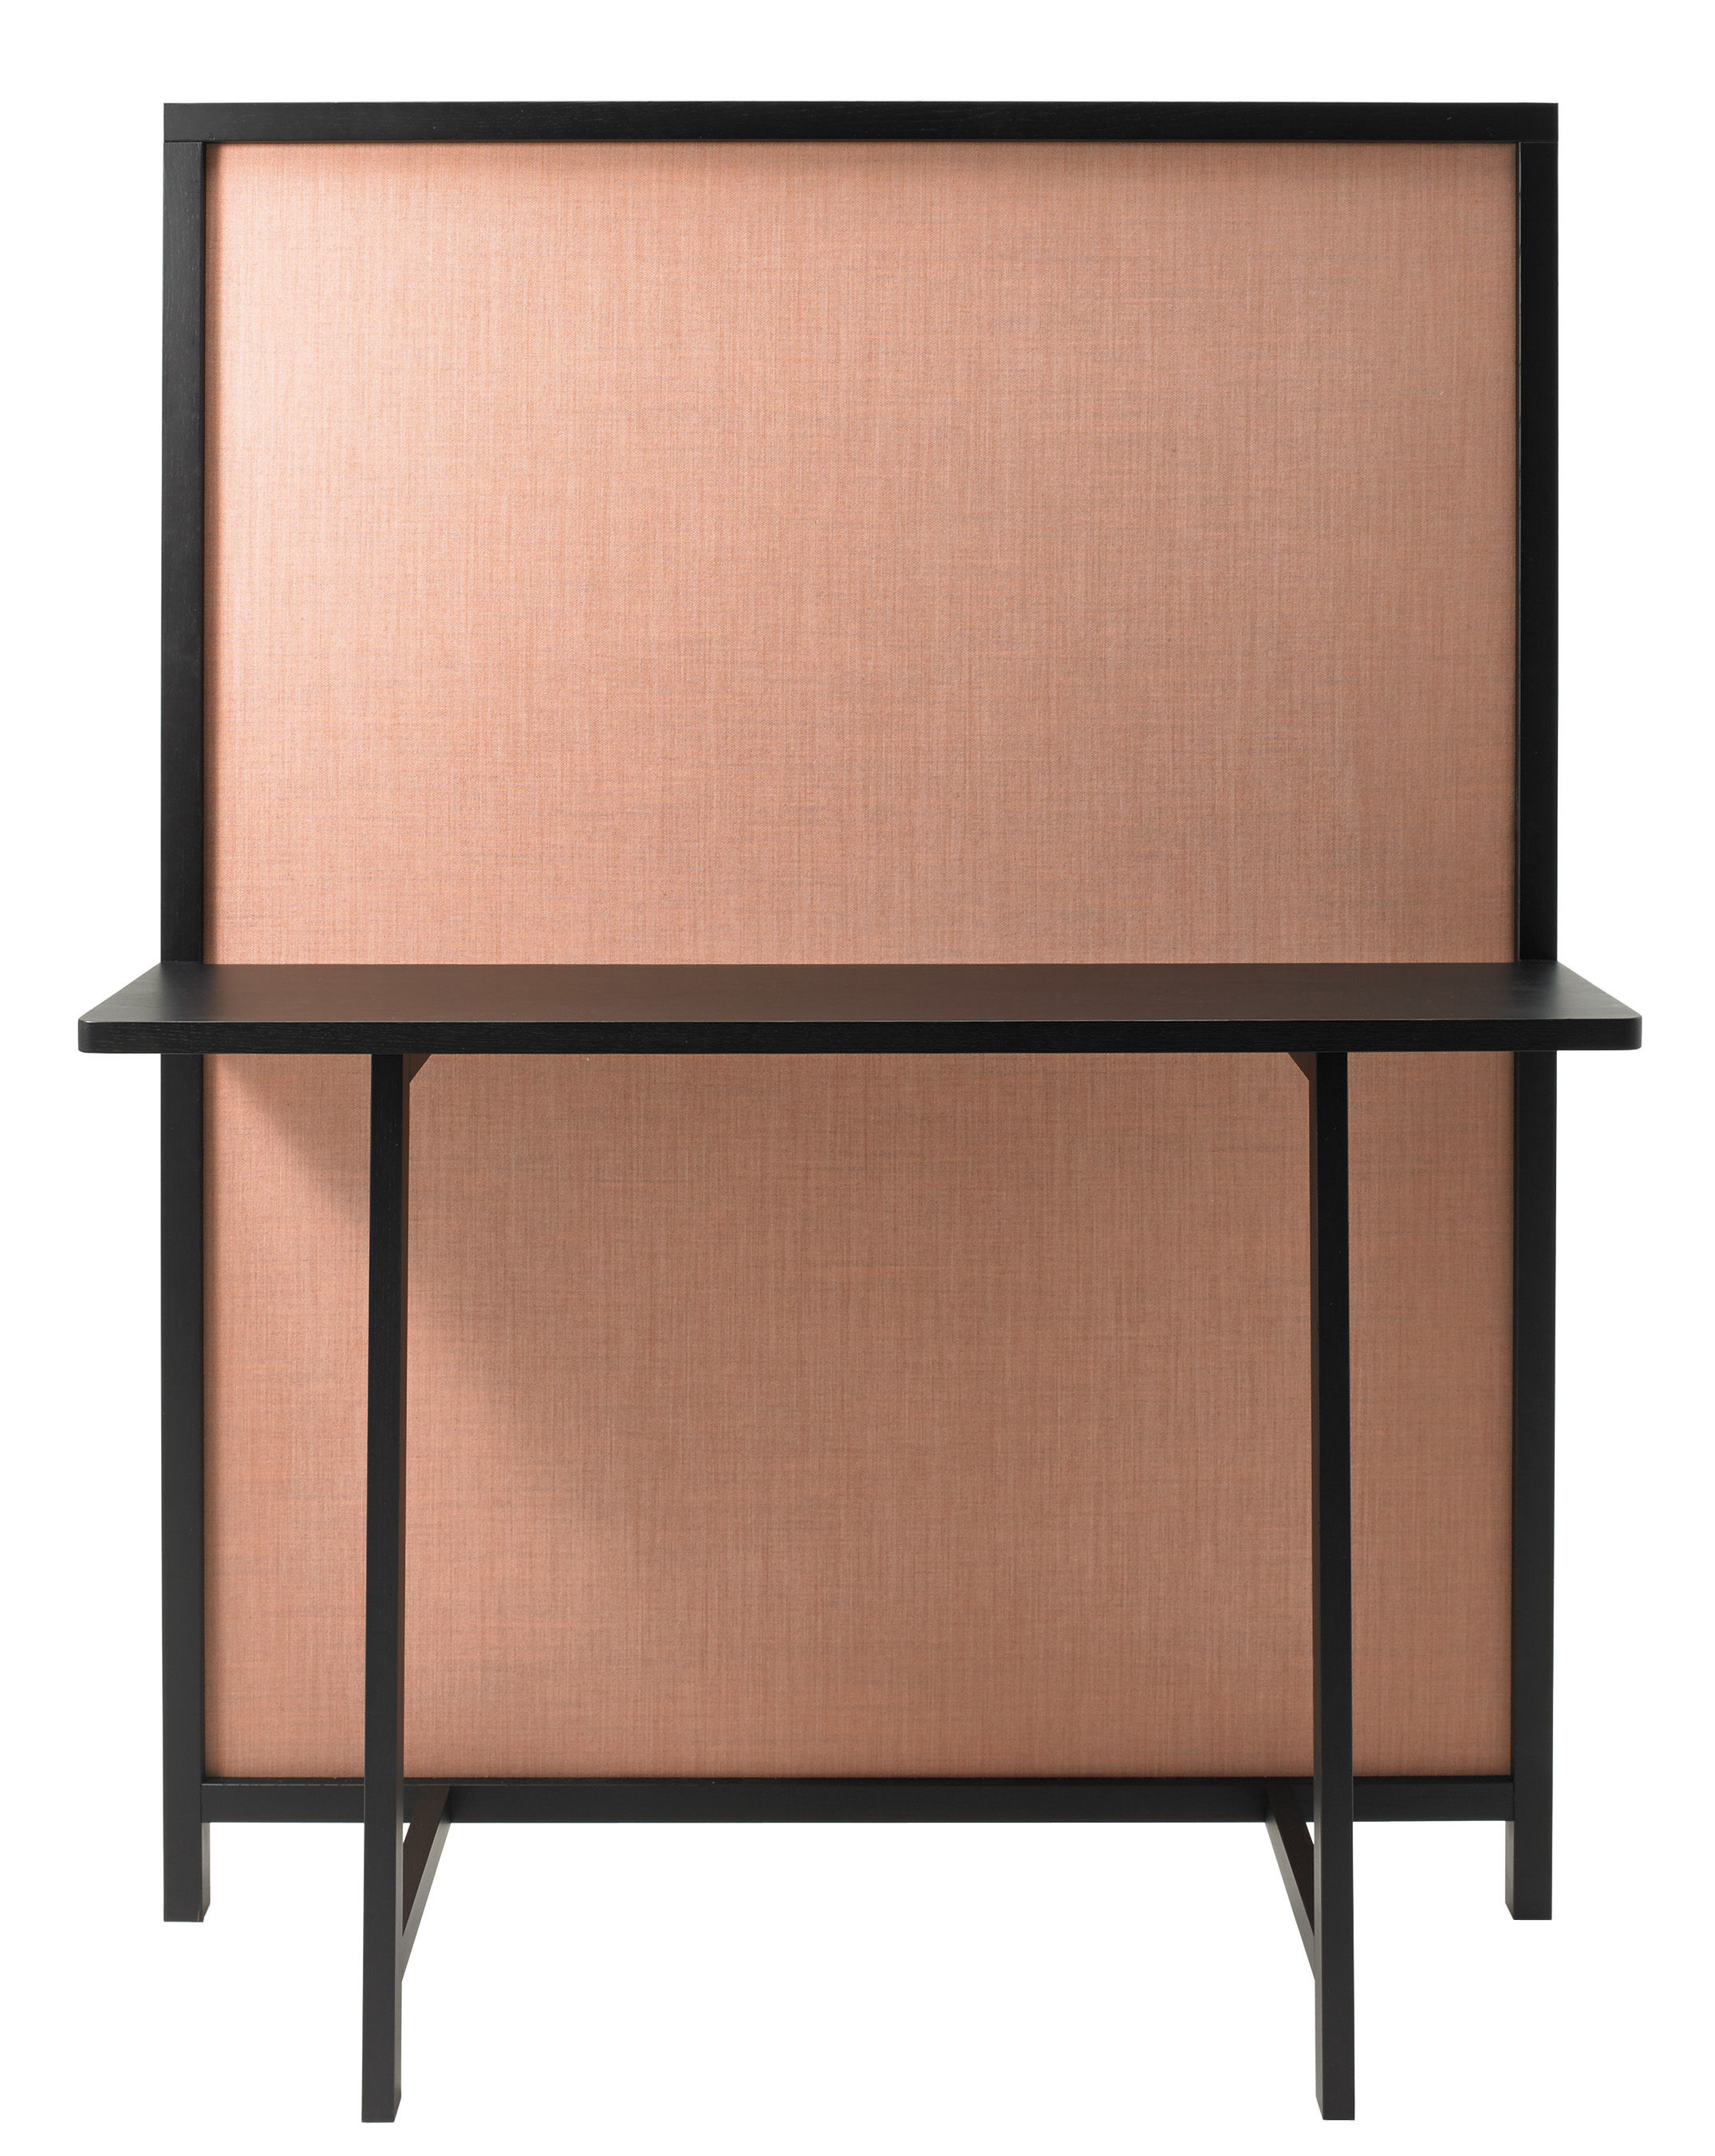 Shoji screen sideboard w 130 x h 170 cm black pink for Sideboard 50 cm